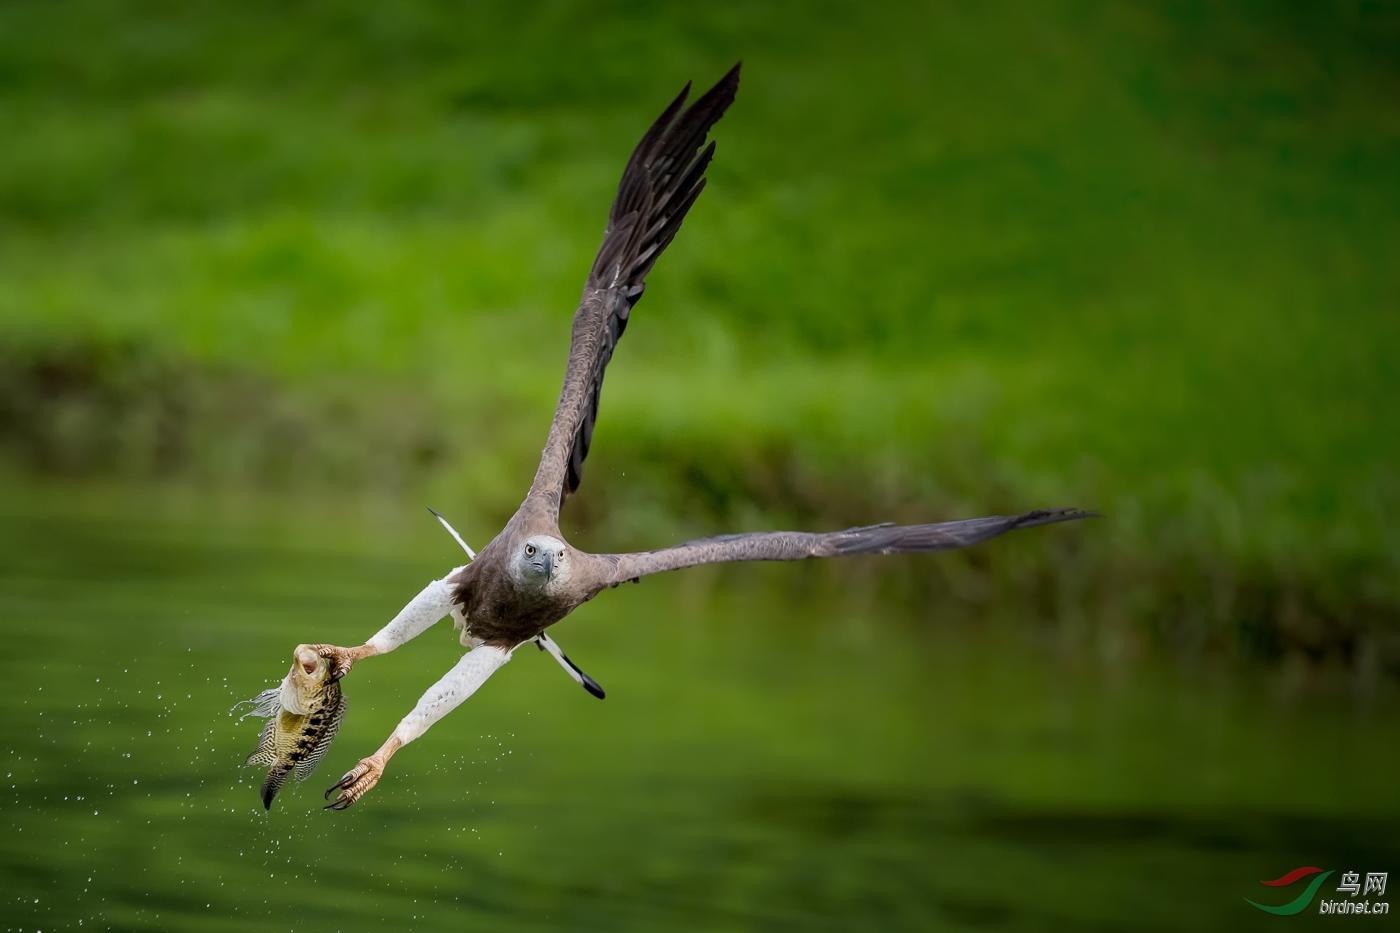 6.Gotcha - Grey-headed Fish Eagle( 渔归 - 灰头渔雕)_真实野生鸟类.jpg